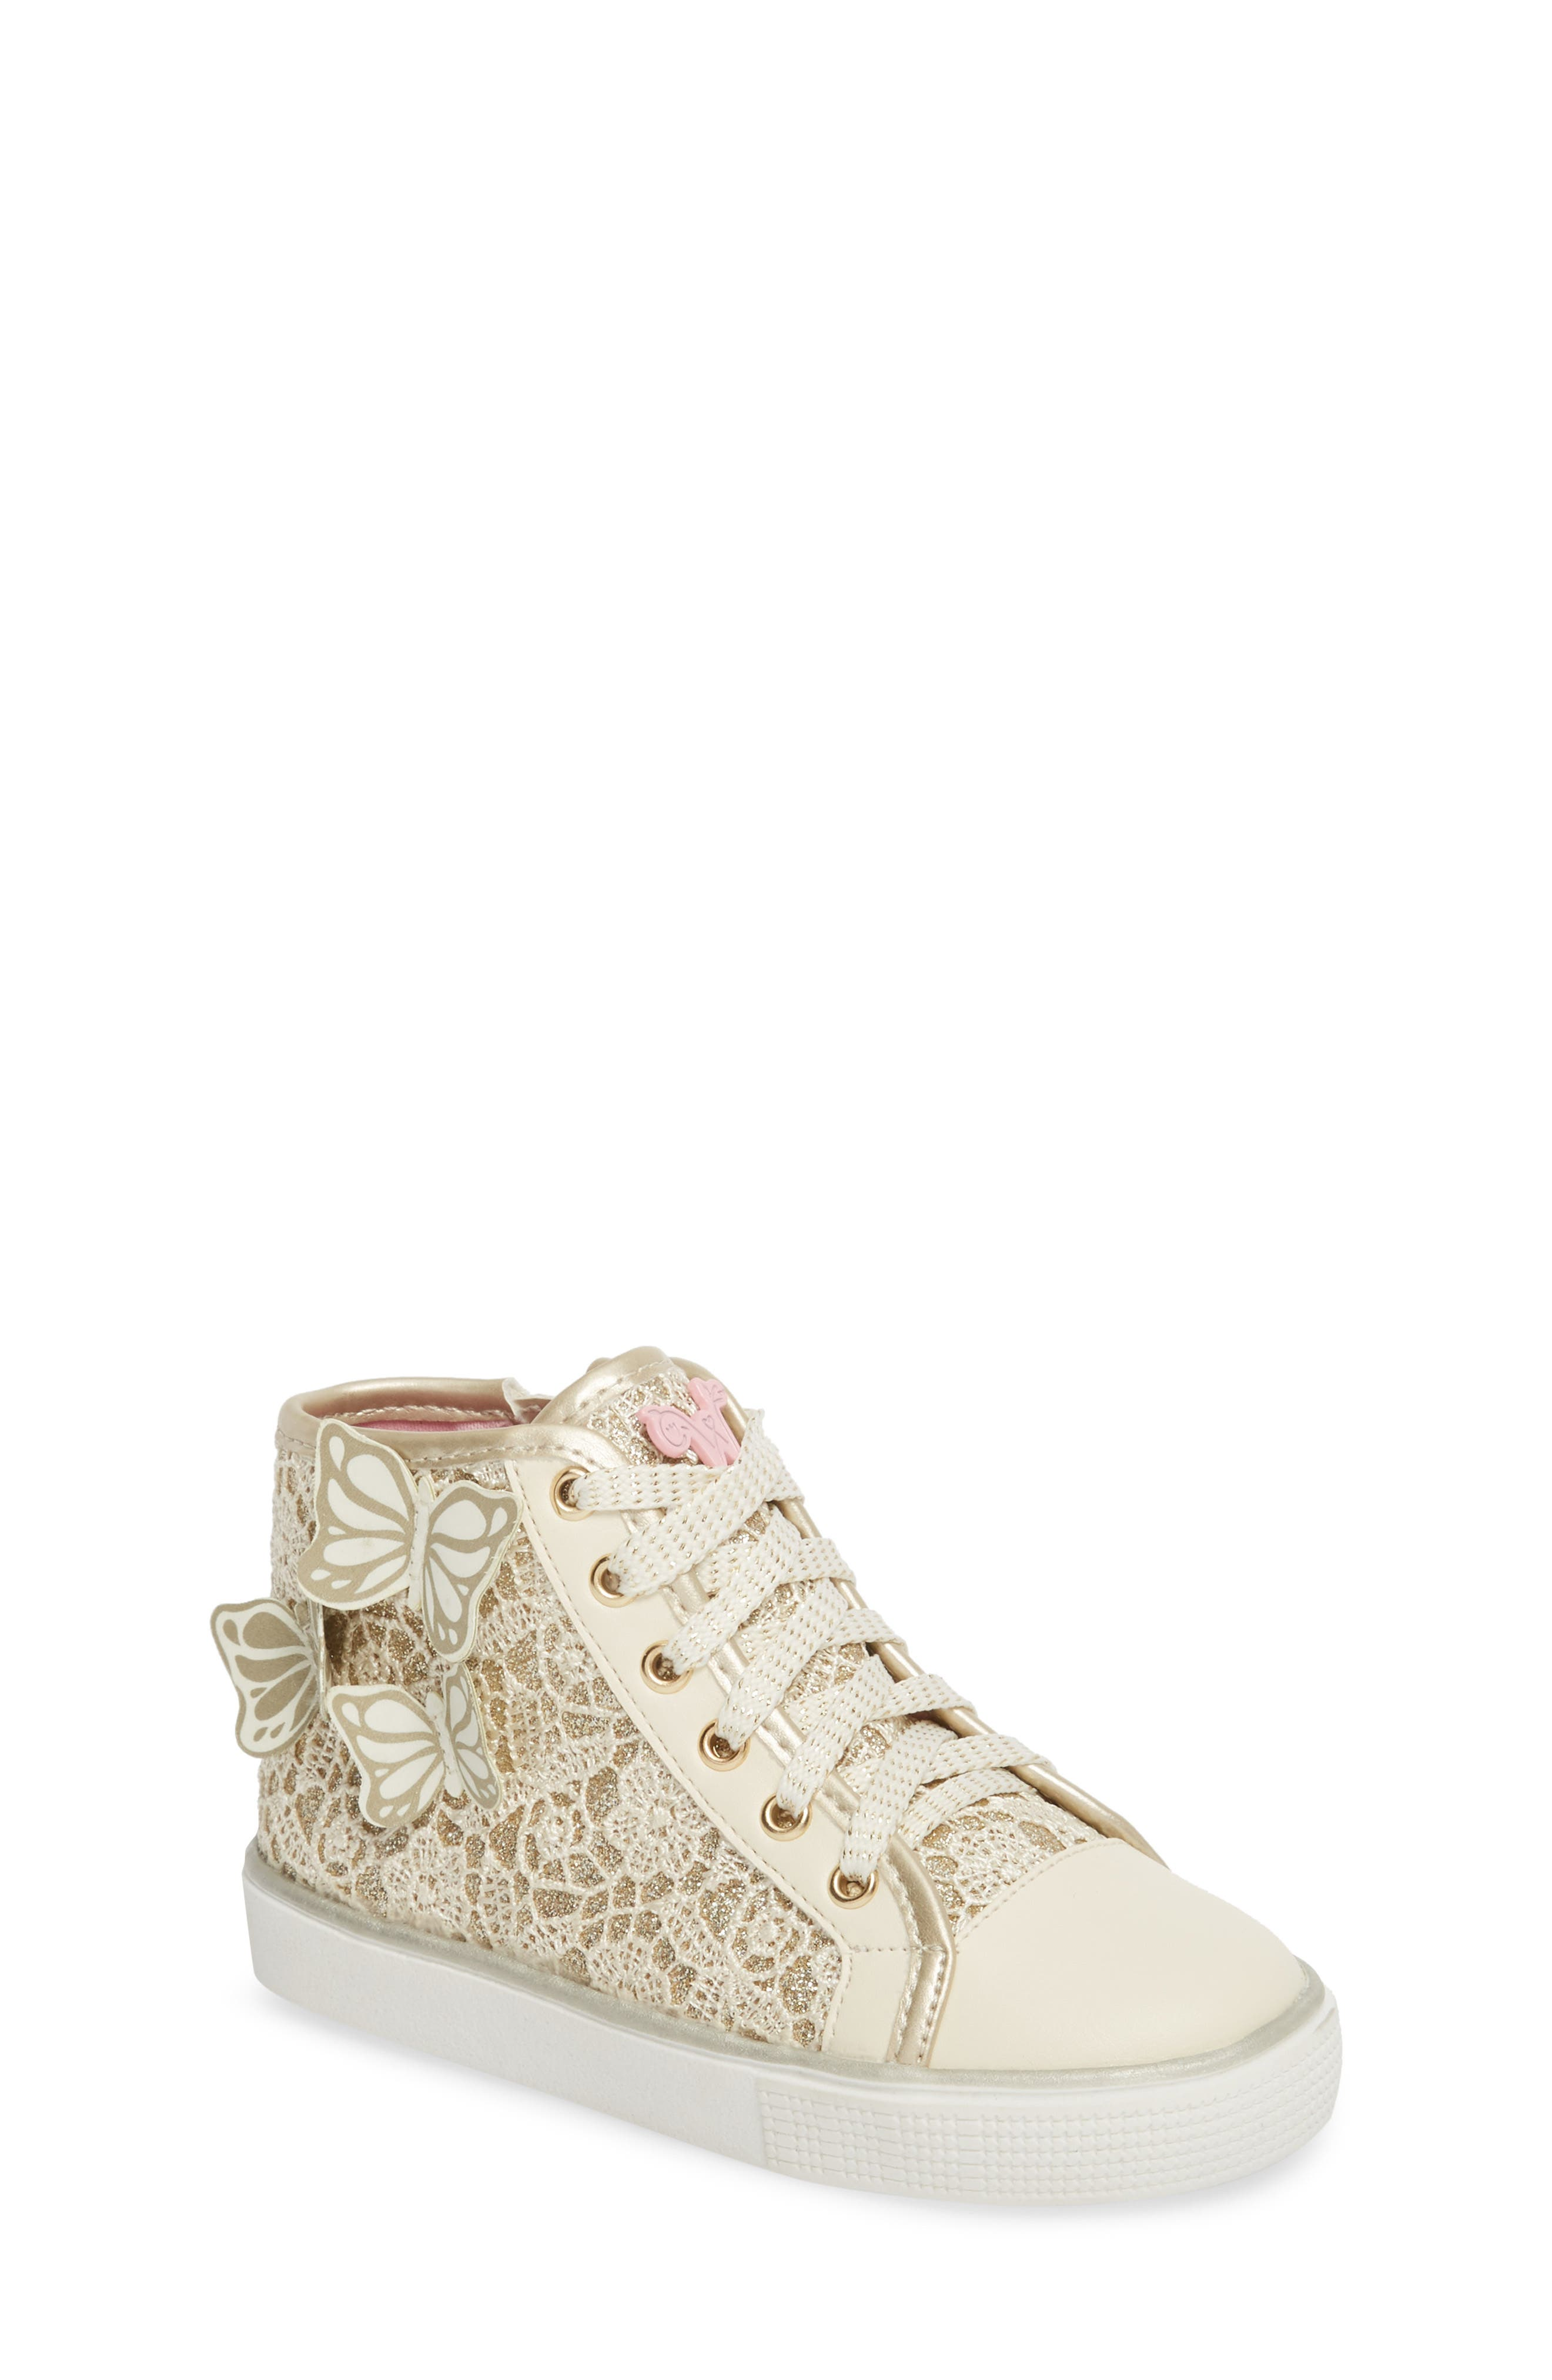 Ashlyn Glitter High Top Sneaker,                         Main,                         color, 710